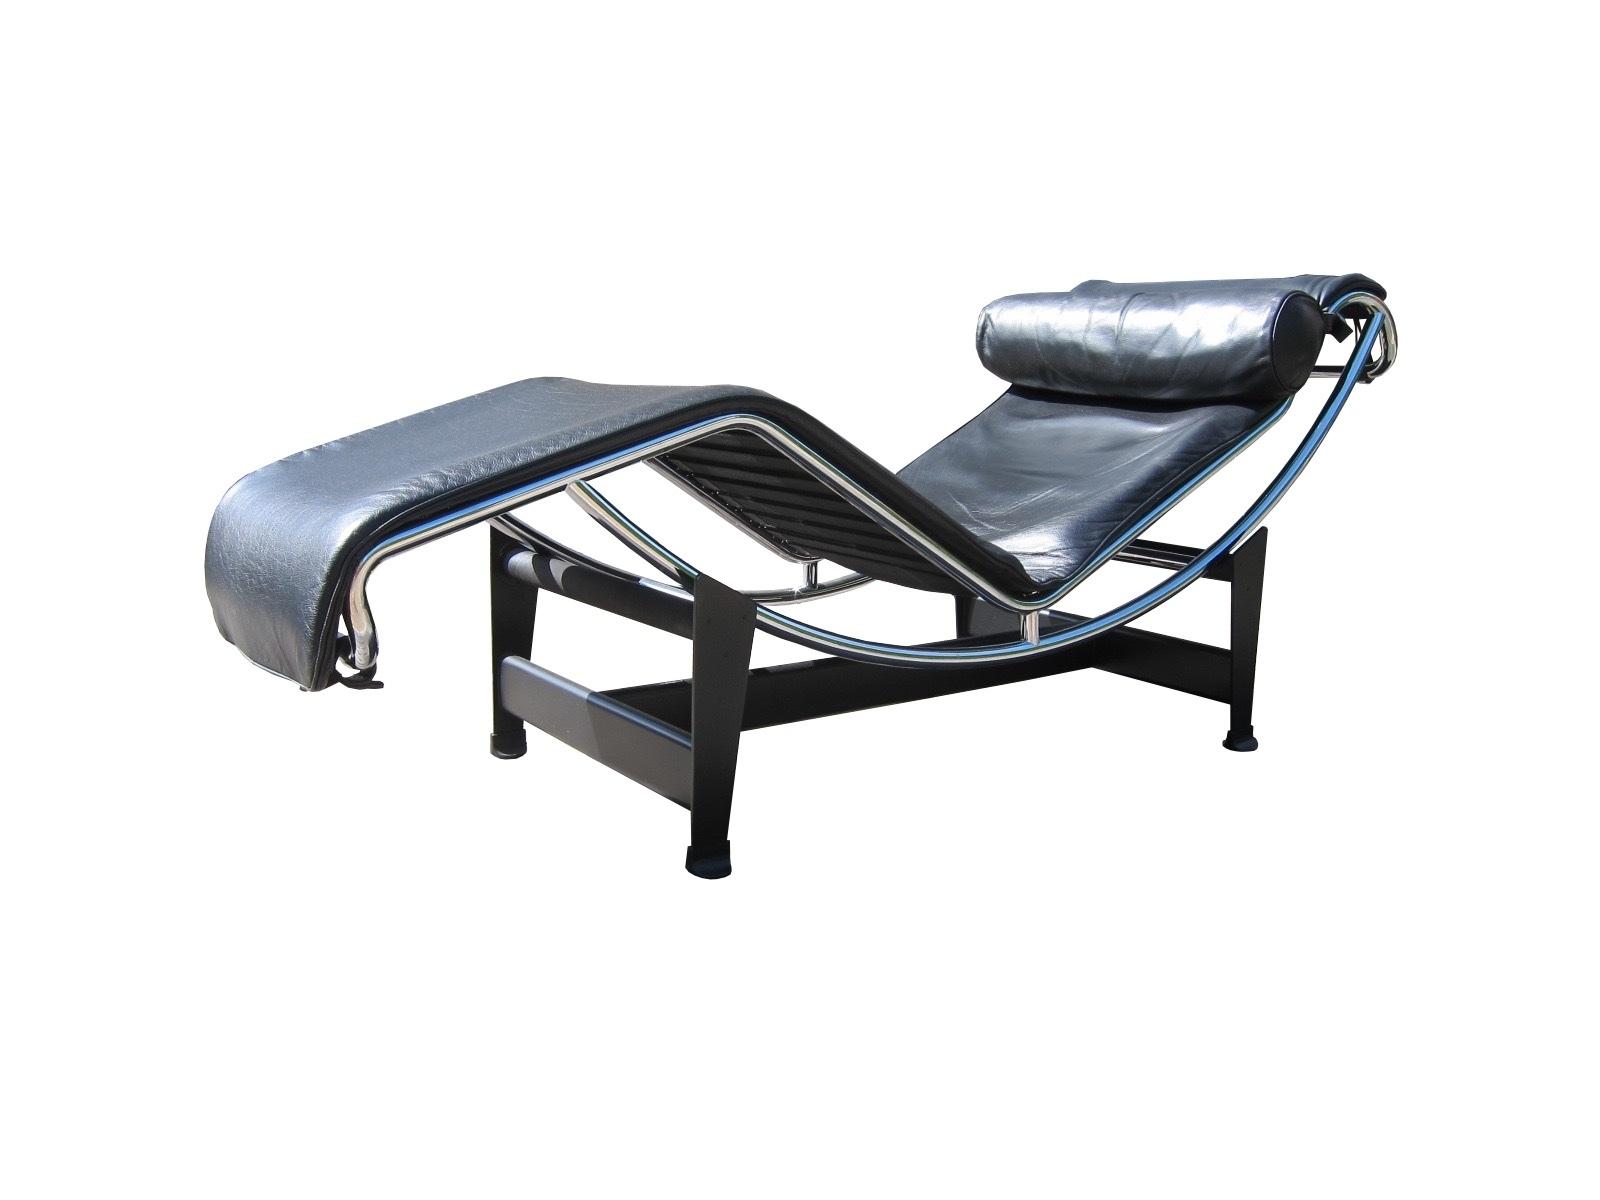 Chaise Longue Longue Corbusier Longue Corbusier Corbusier Longue Chaise Chaise Chaise PXwk0ZnON8